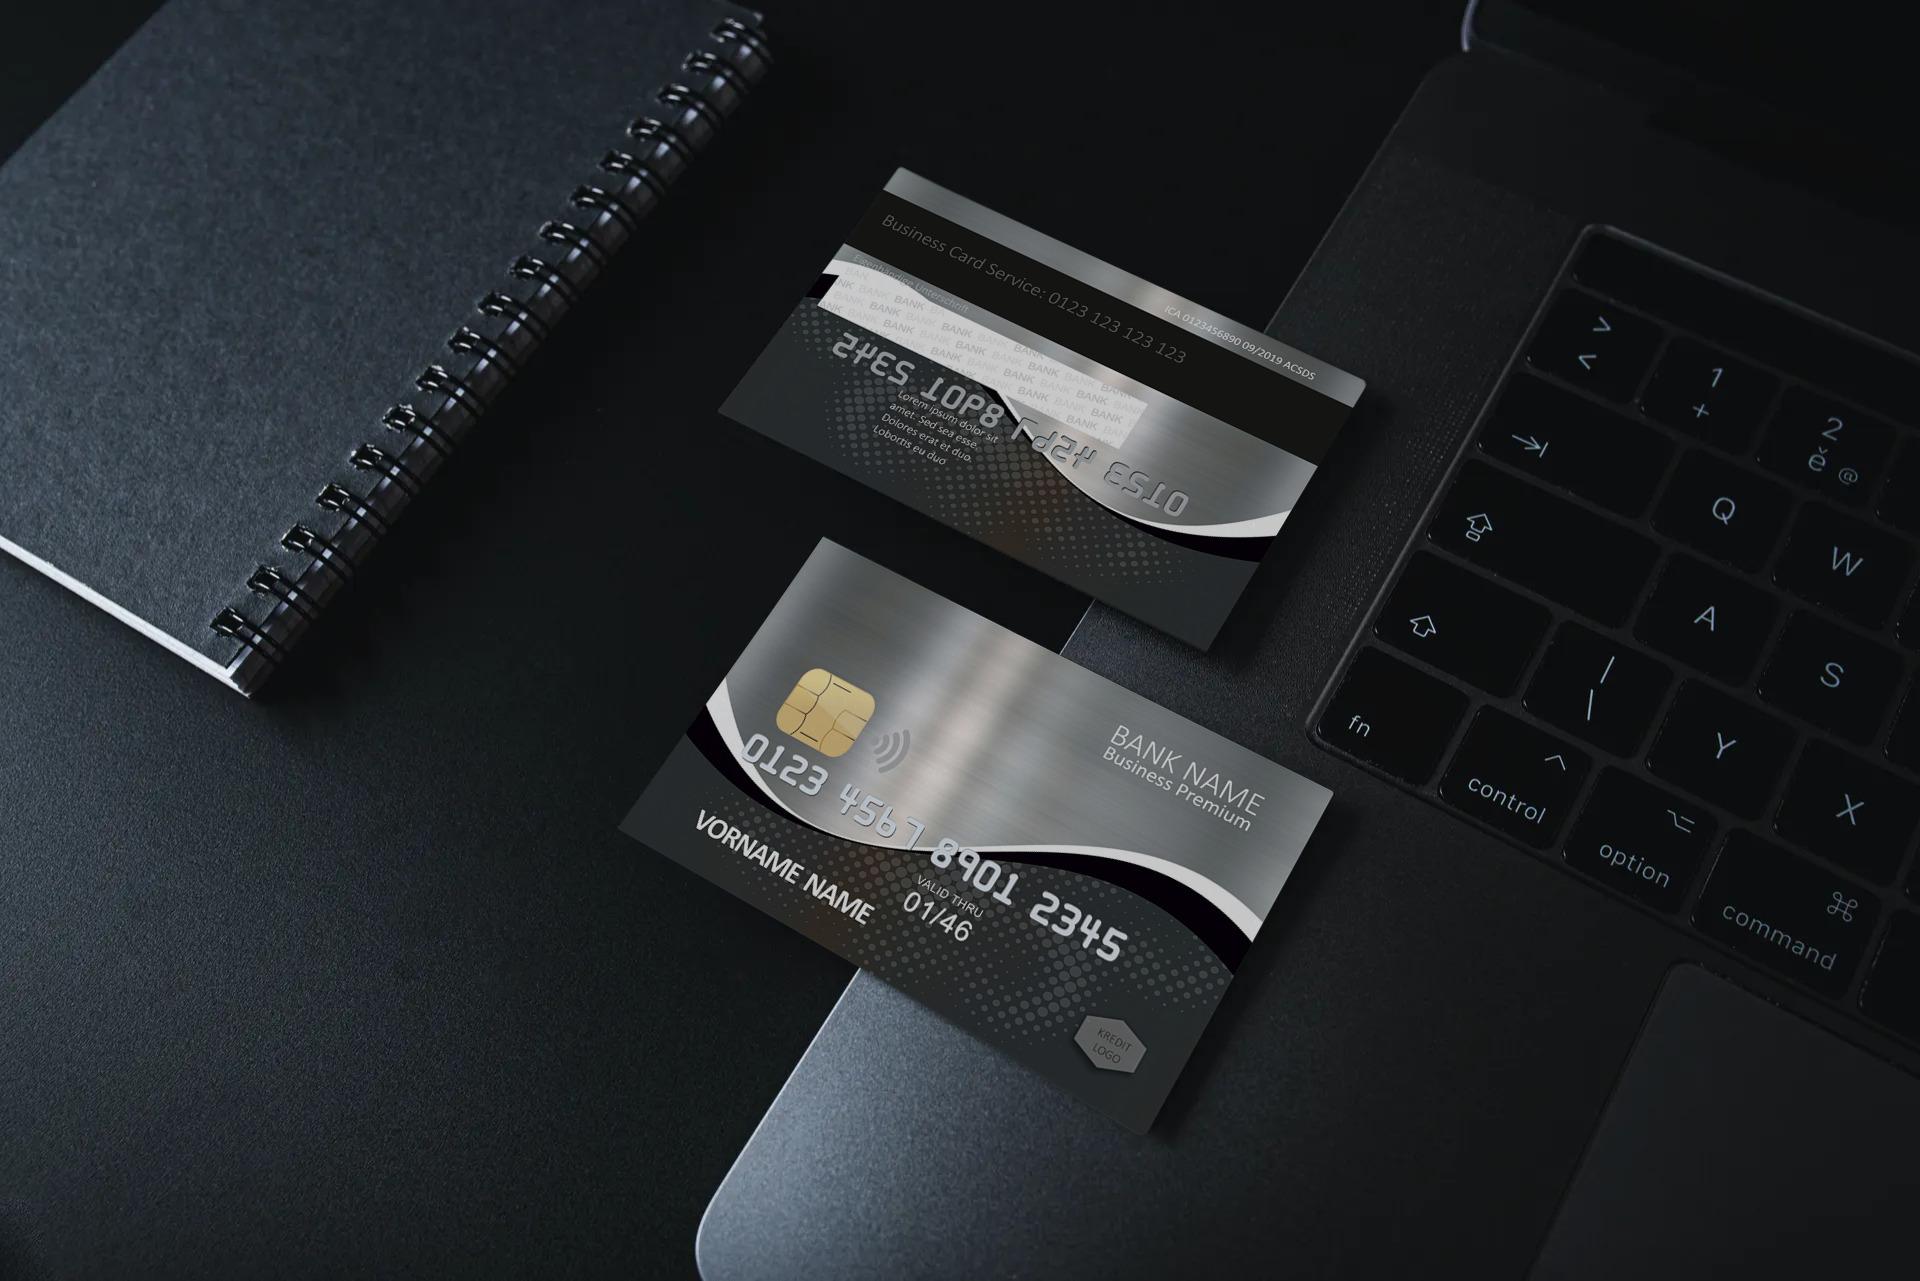 Kreditkarte Designvorlage KC-2019-000115 - TEXTAG GROUP